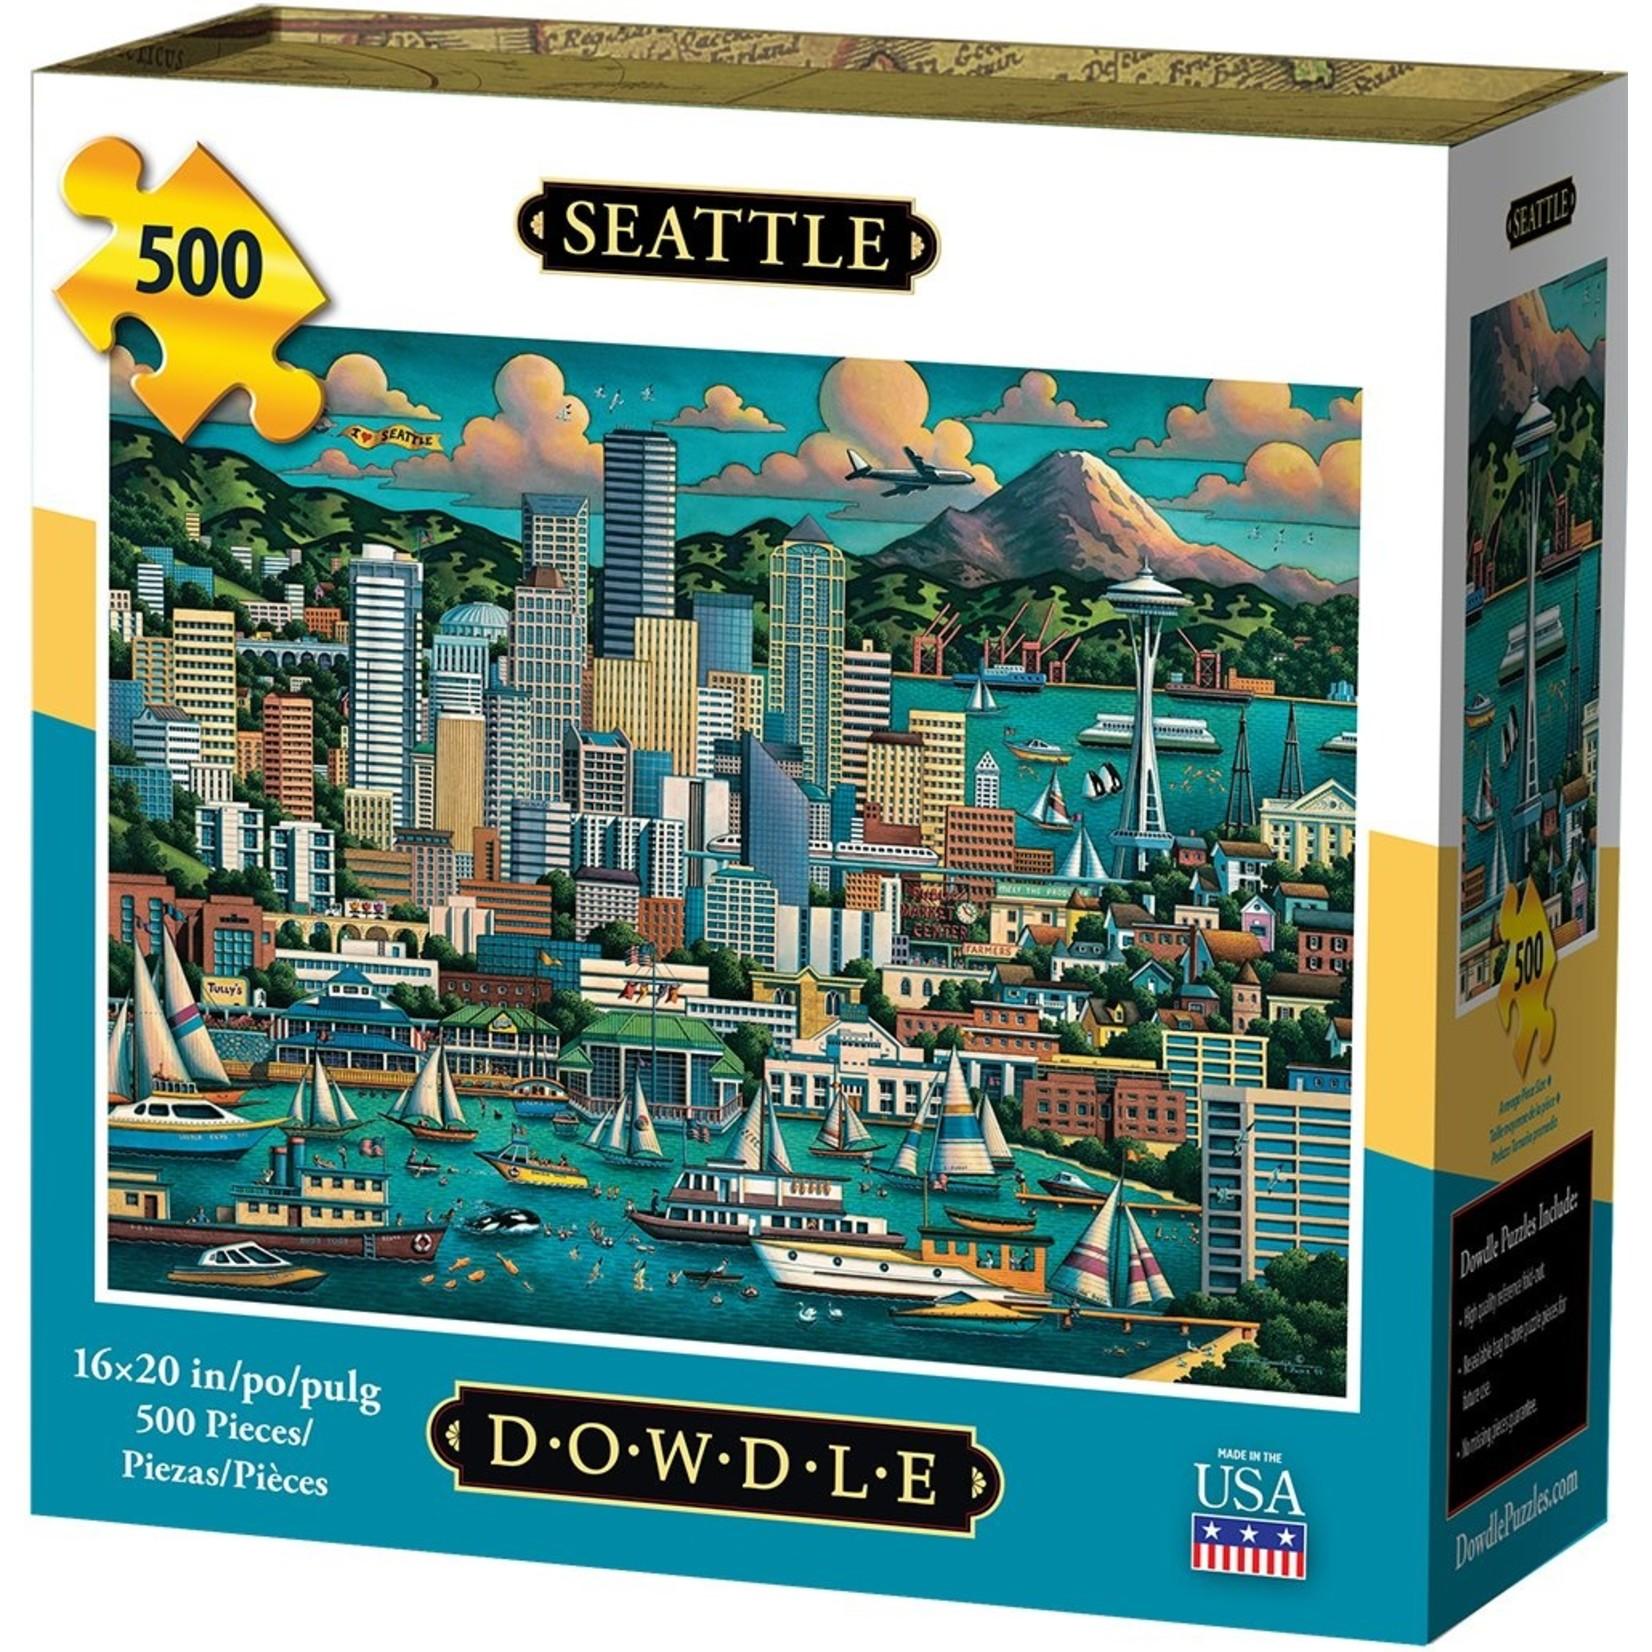 Dowdle Folkart Seattle 500pc